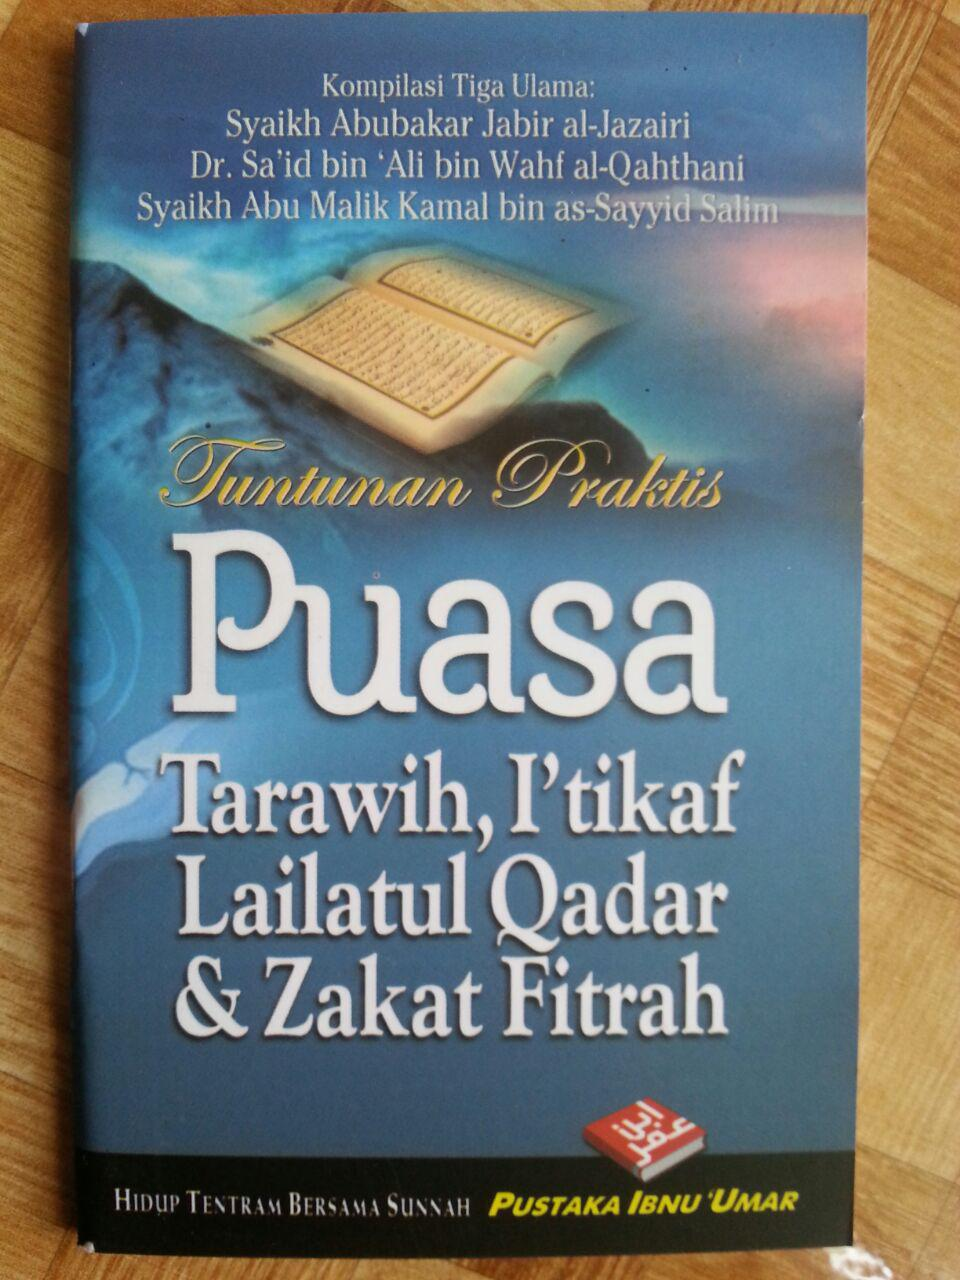 Buku Saku Tuntunan Praktis Puasa Tarawih I'tikaf Lailatul Qadar dan Zakat Fitrah cover 2